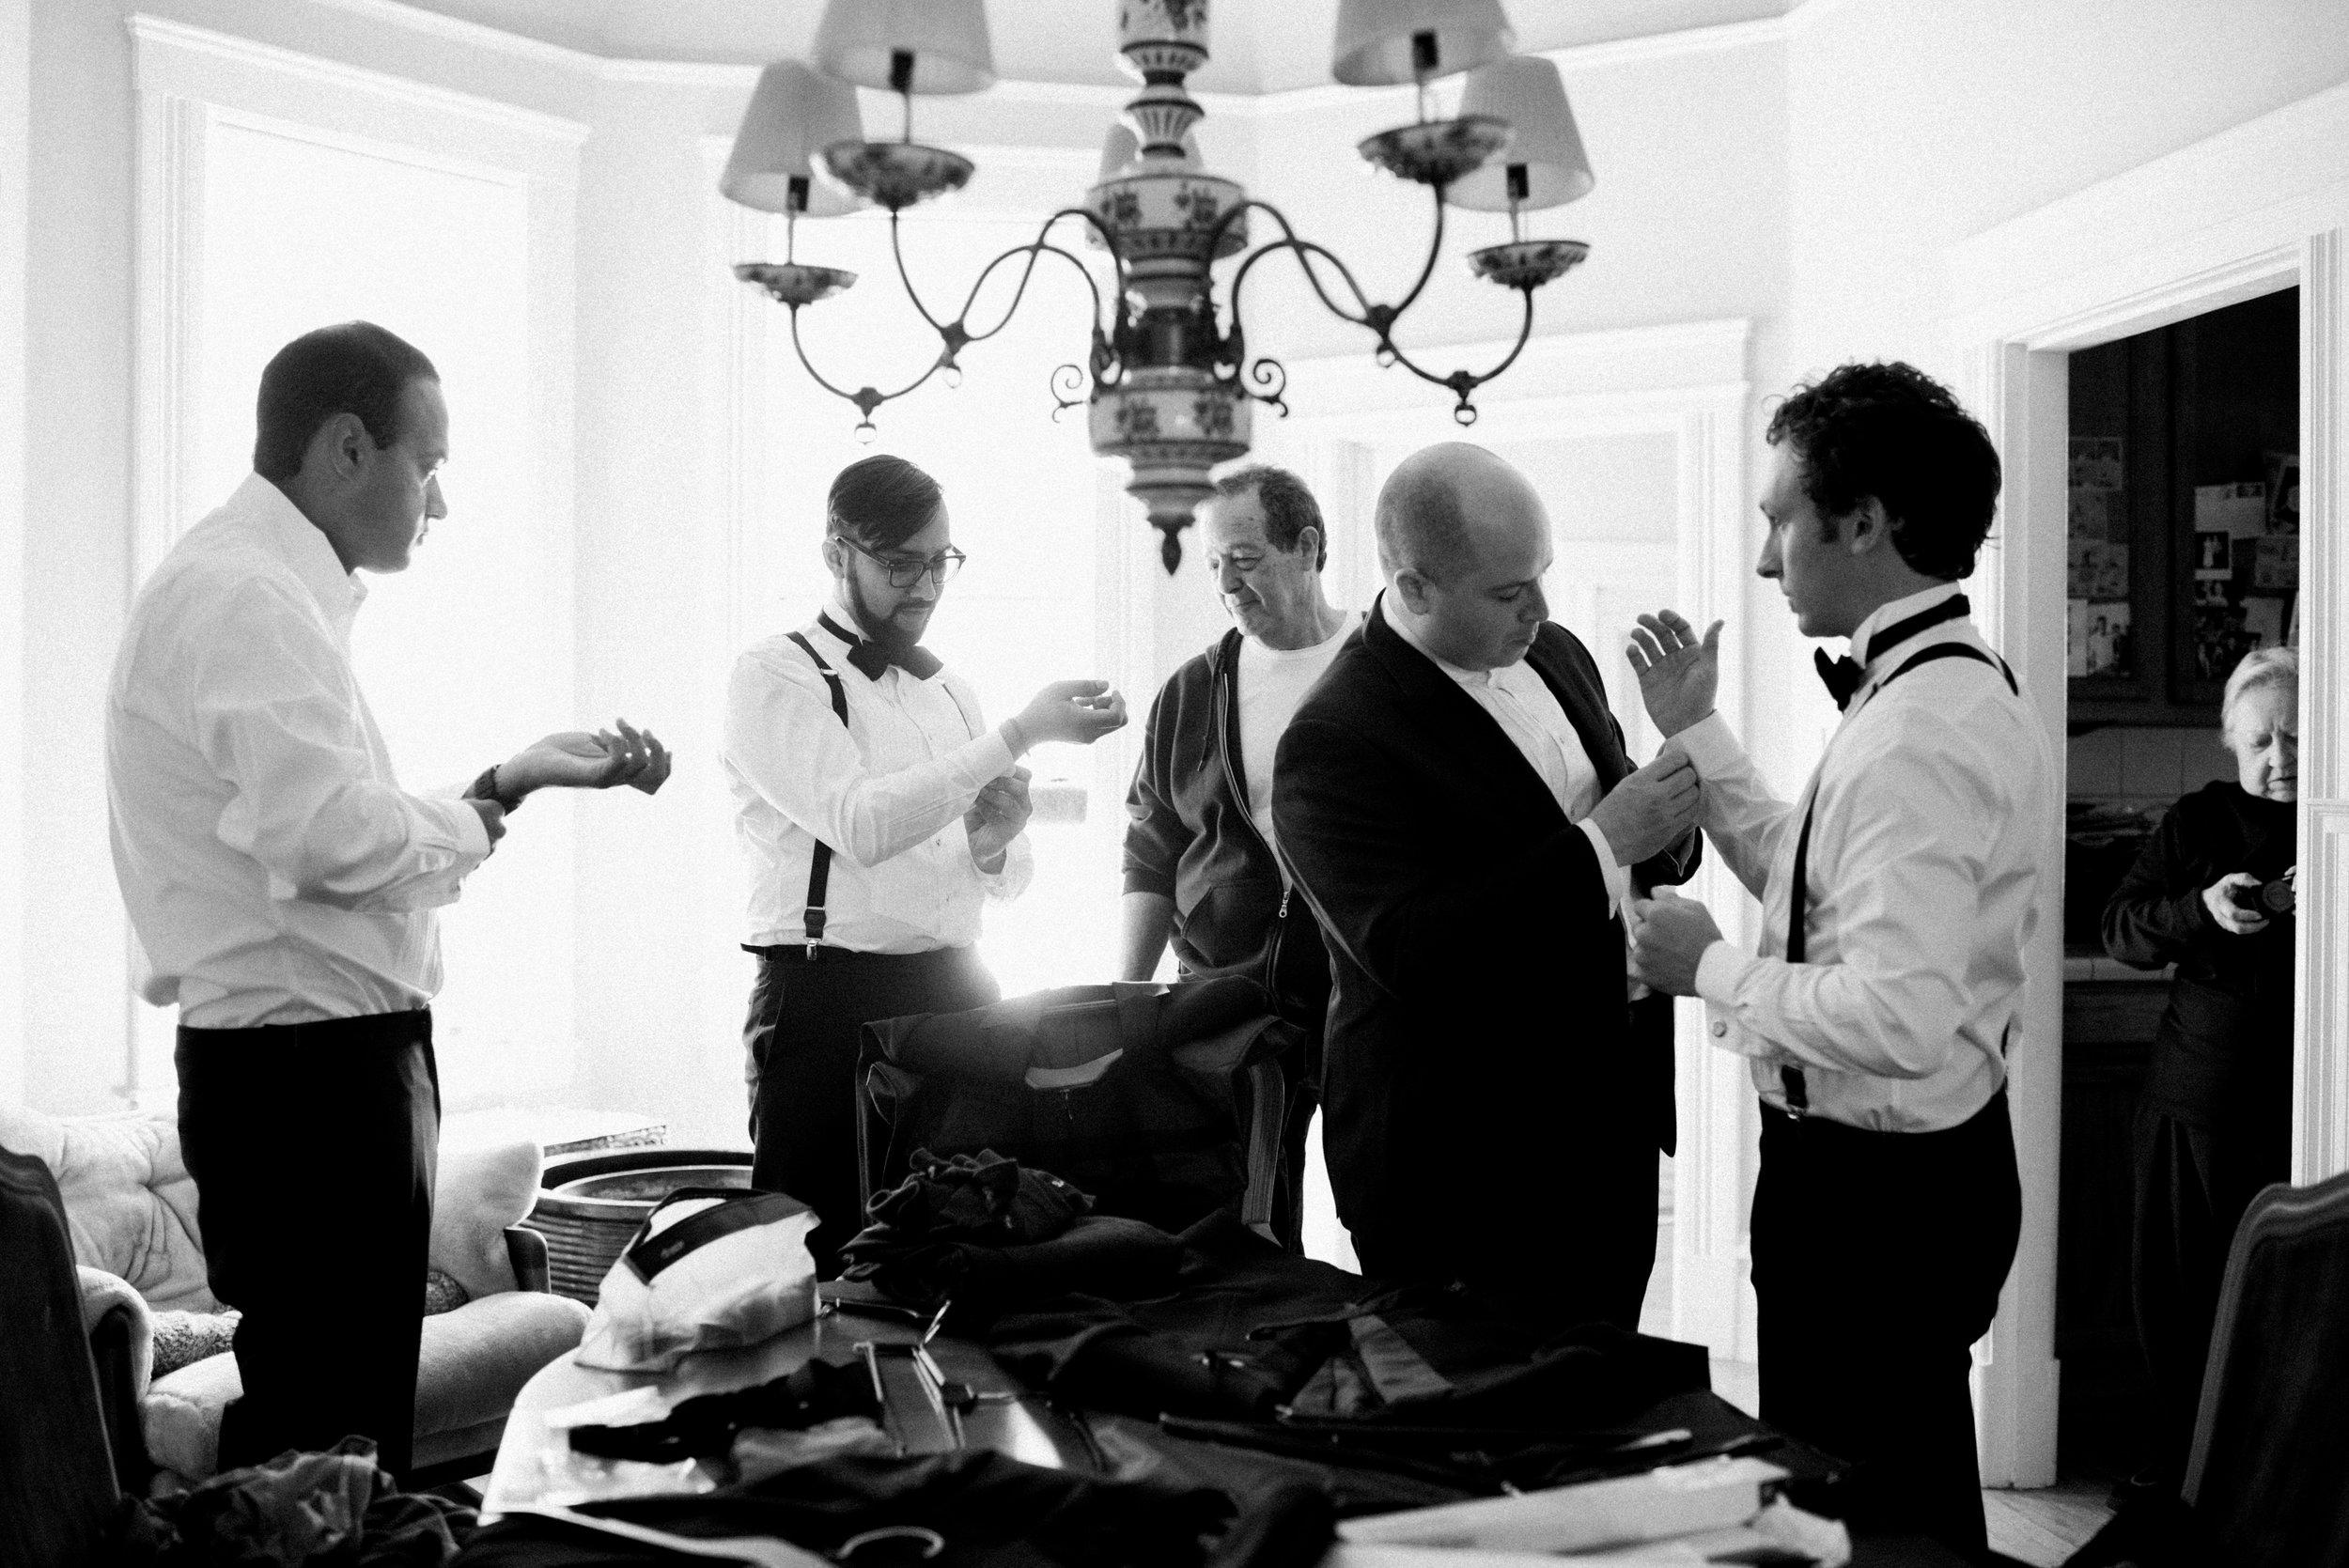 Swedenborgian Church Dogpatch Winery Wedding009.jpg